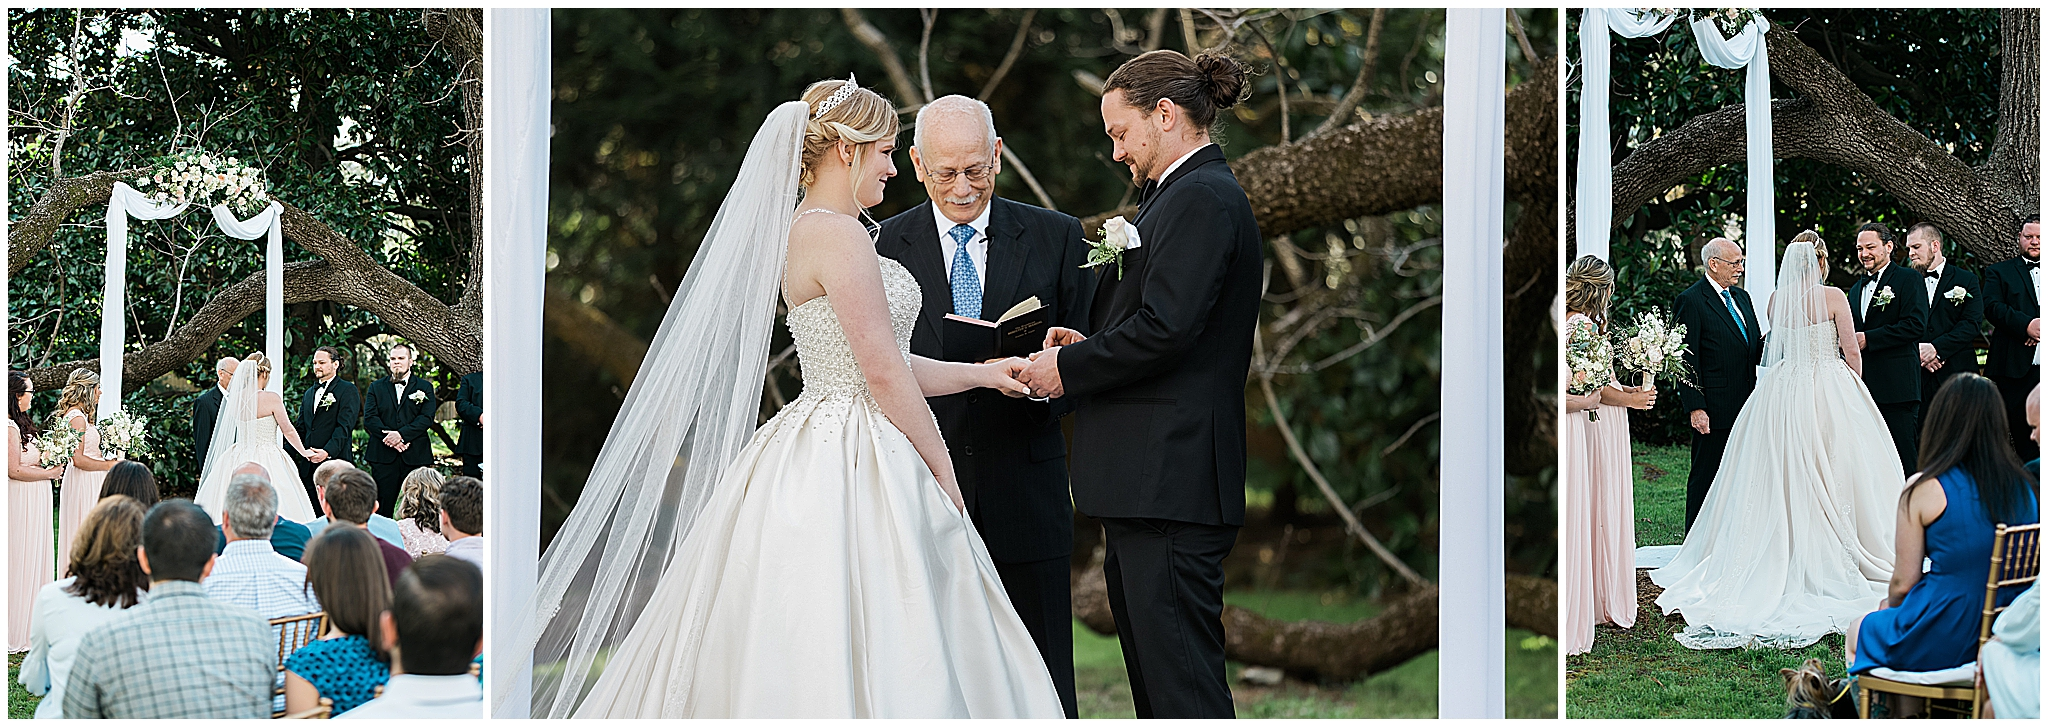 Wedding_Photographers_Asheville_Mountain_Magnolia_Inn_0016.jpg